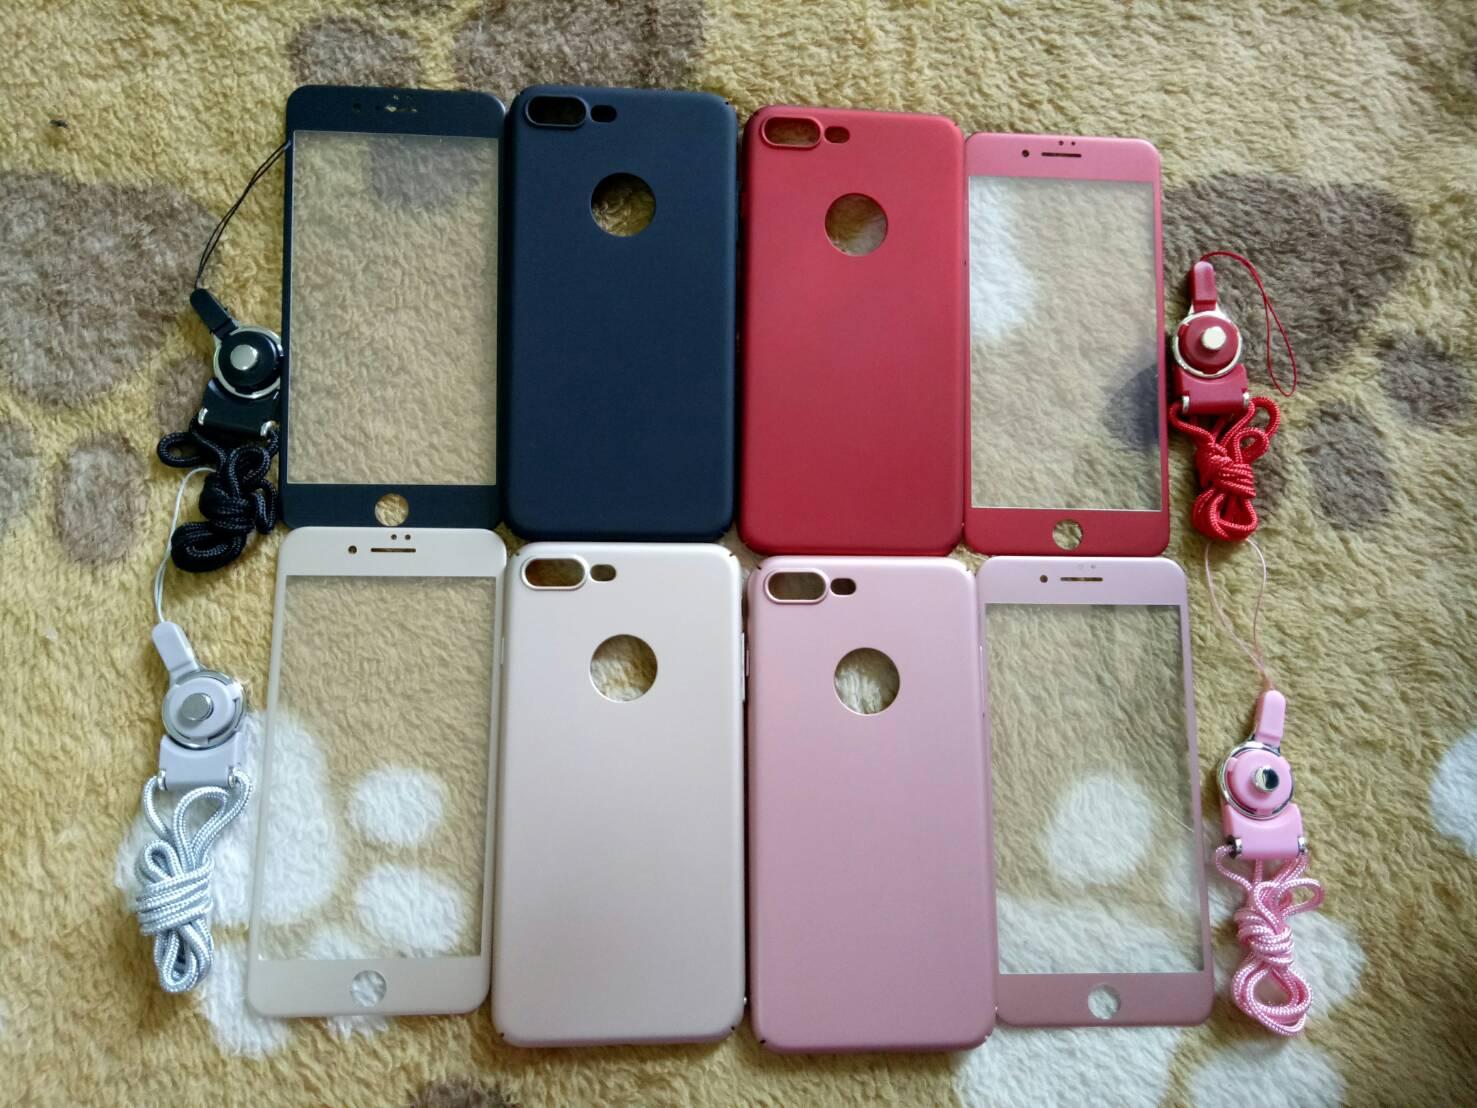 PC พร้อมกระจกสี(มีสายห้อยคอ) iphone7 plus/iphone8 plus(ใช้เคสตัวเดียวกัน)